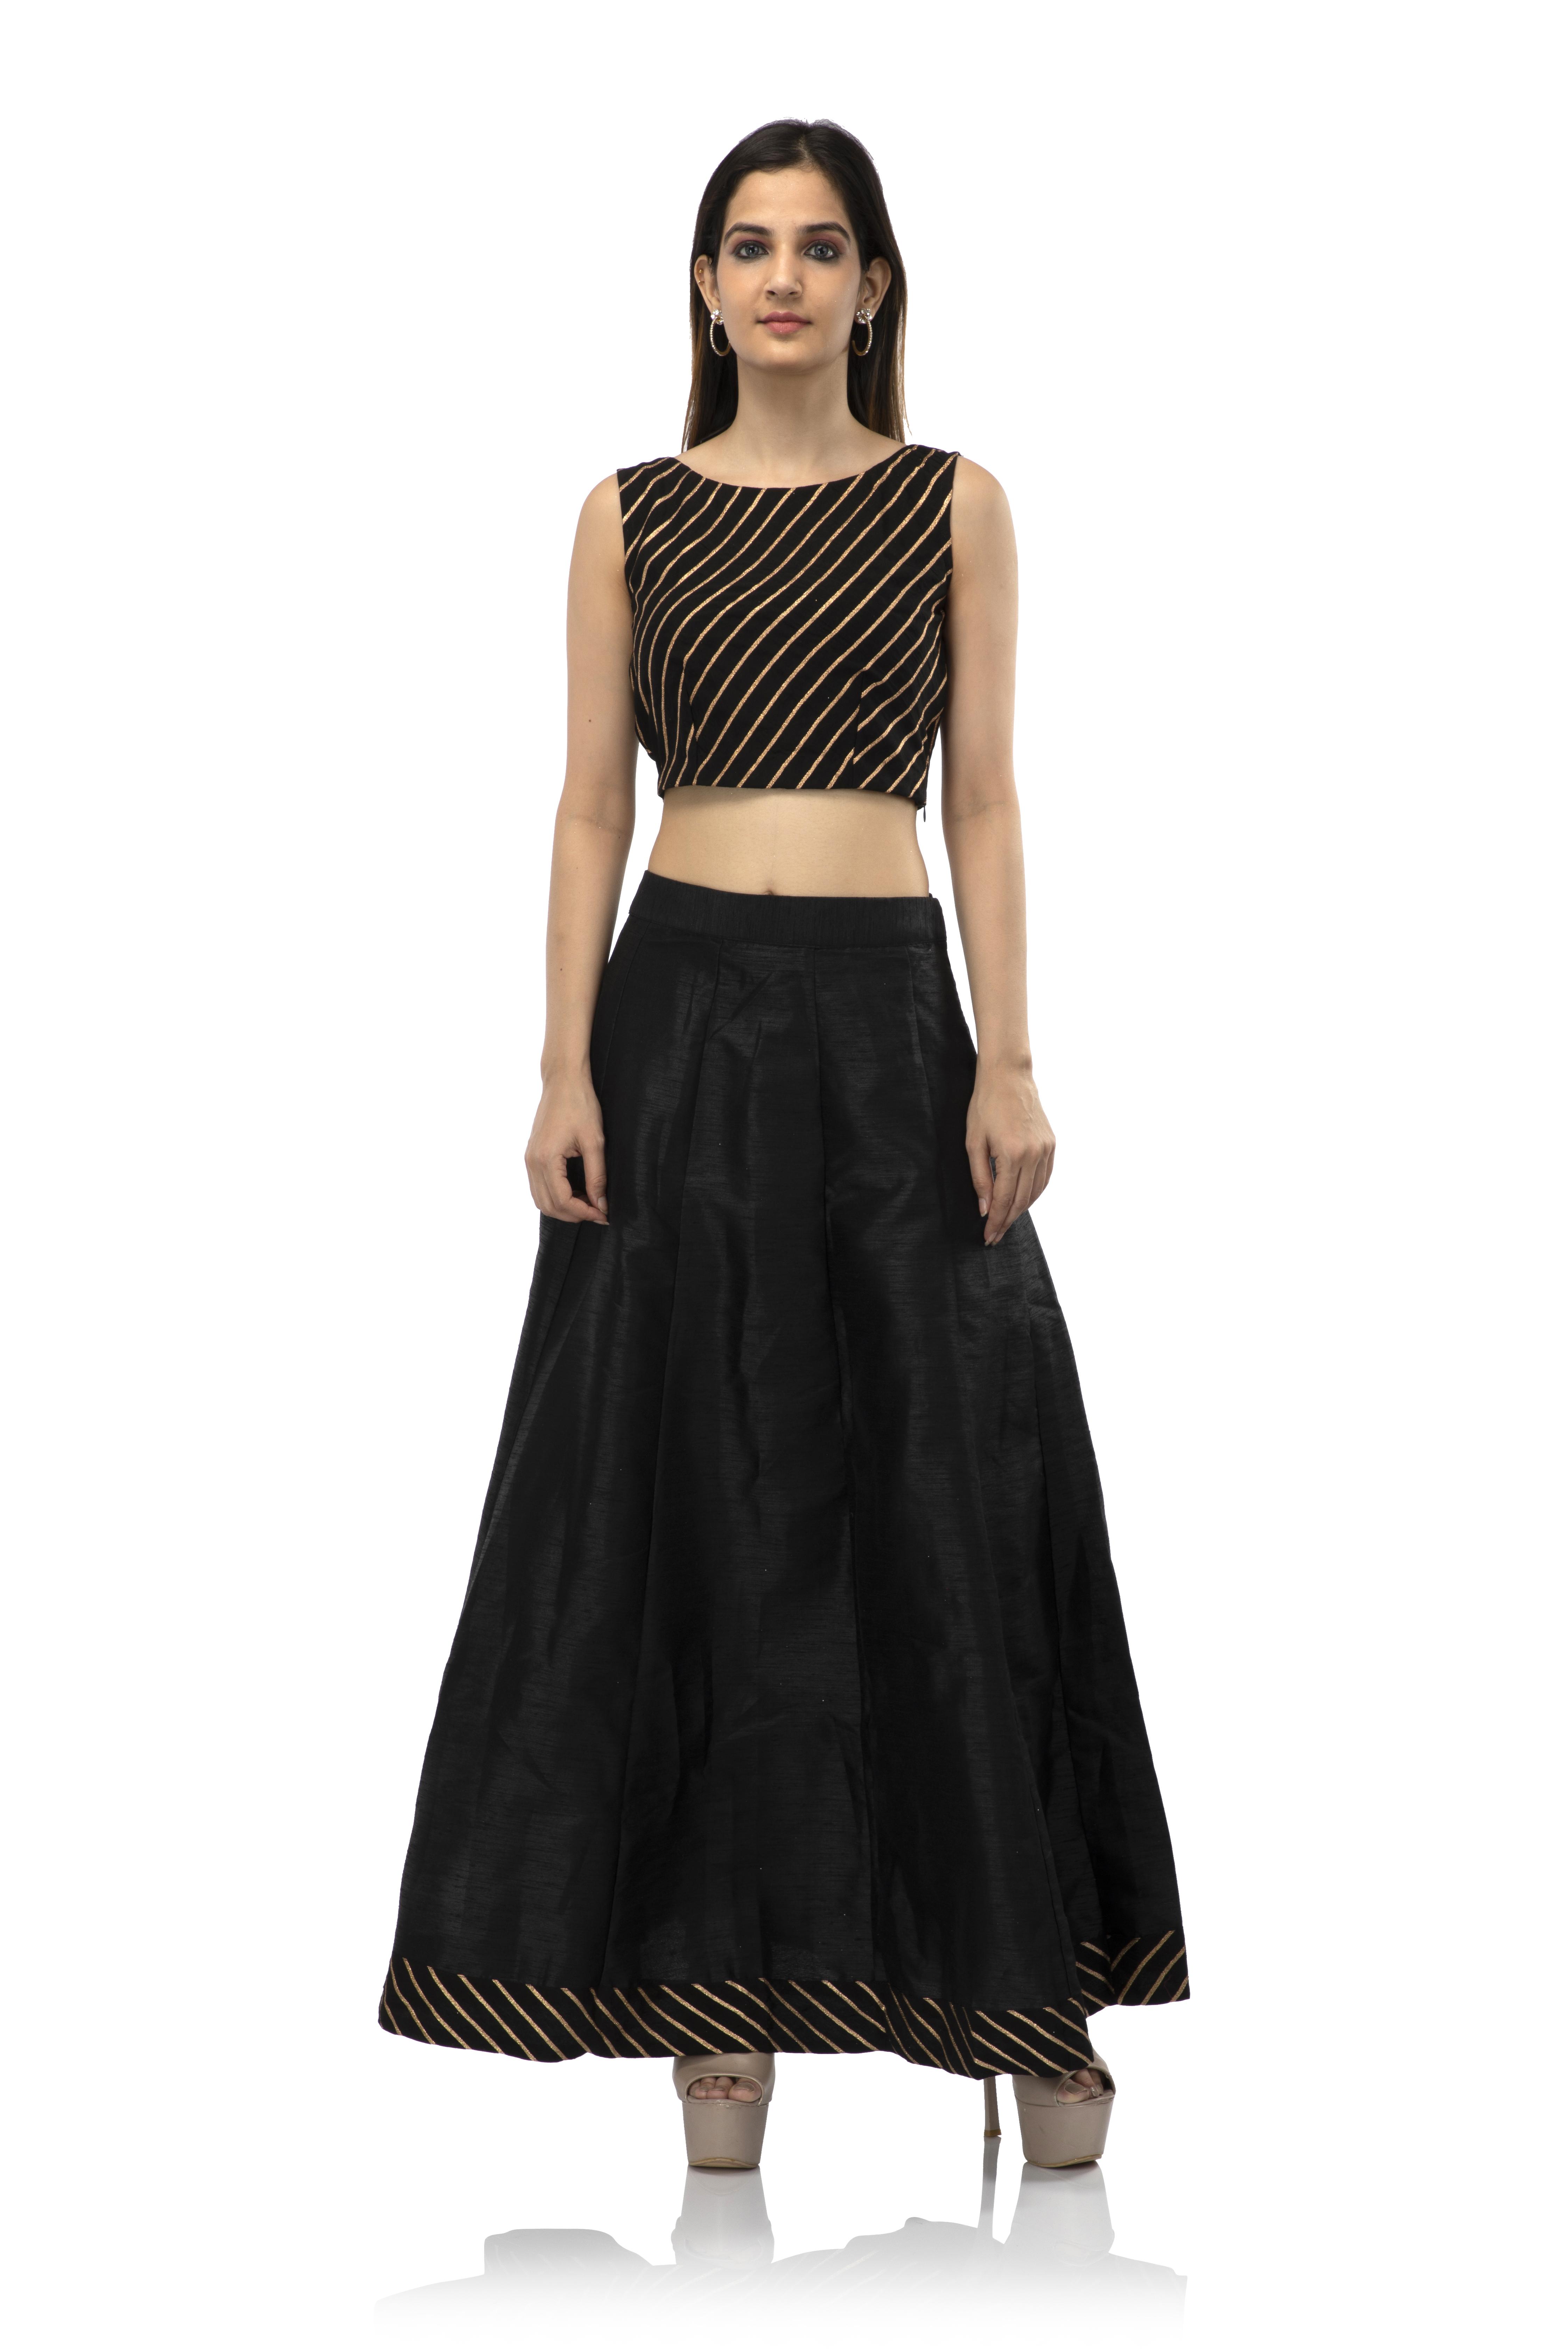 becoming | Women's Silk Solid Ethnic Wear Raw Silk Black Skirt